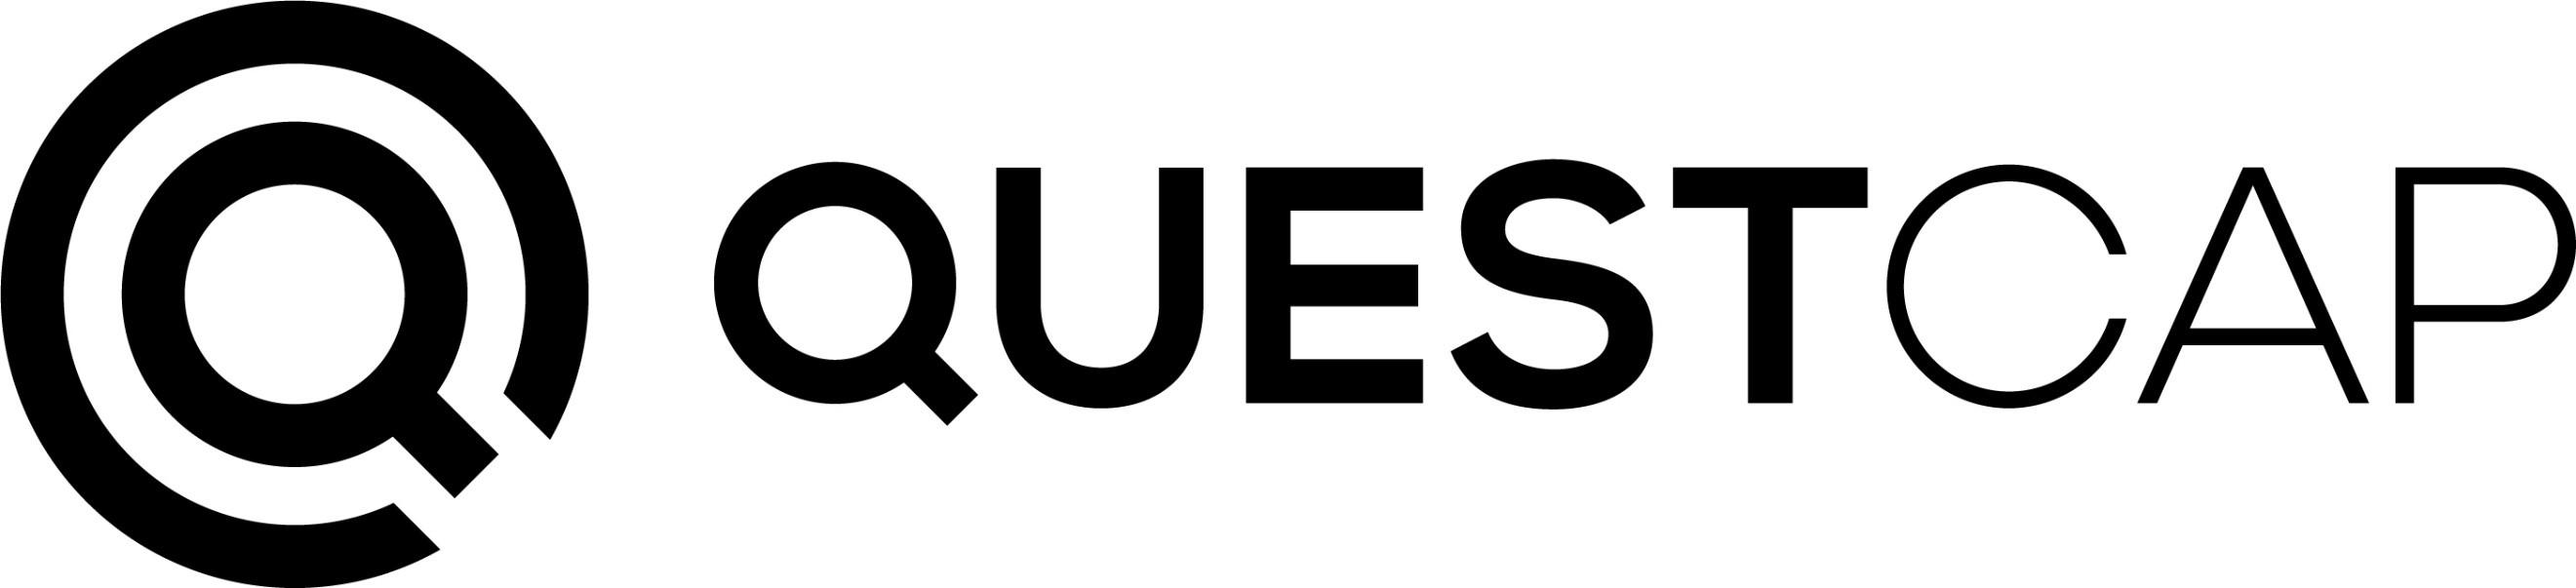 QuestCap Completes Acquisition of Amino Therapeutics